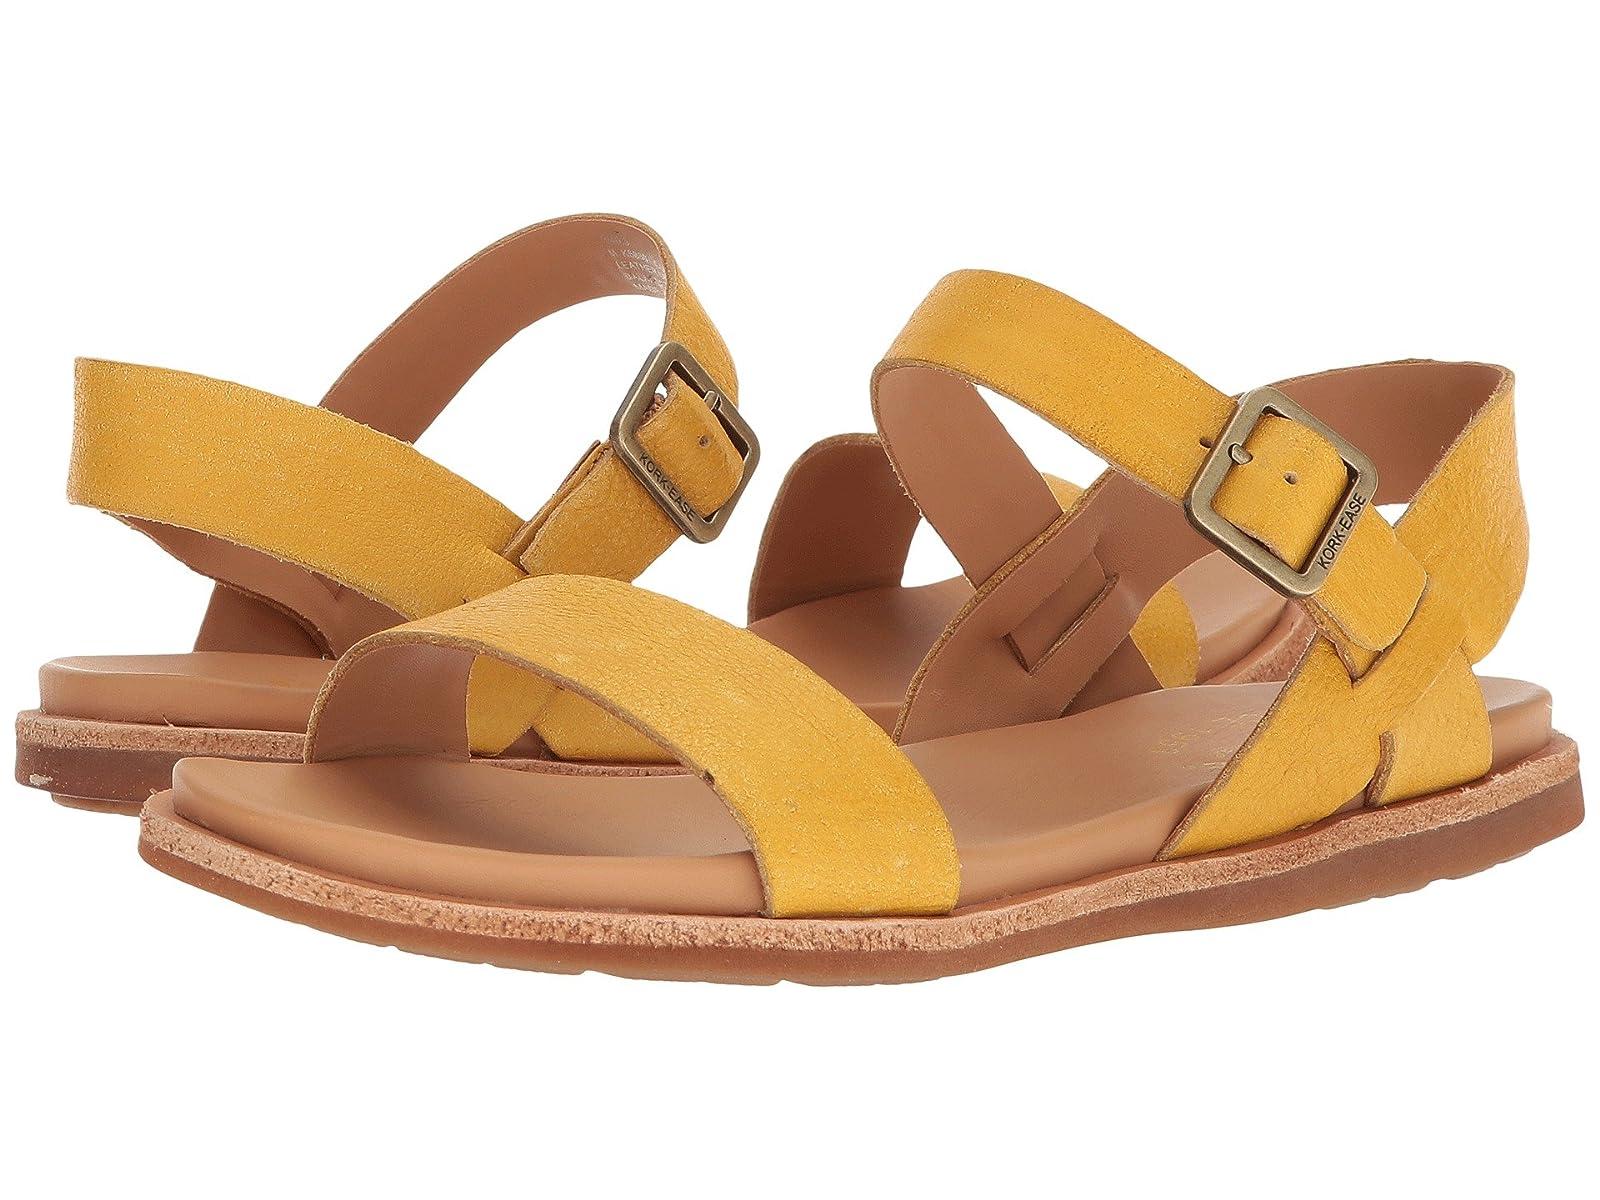 Kork-Ease YuccaAtmospheric grades have affordable shoes